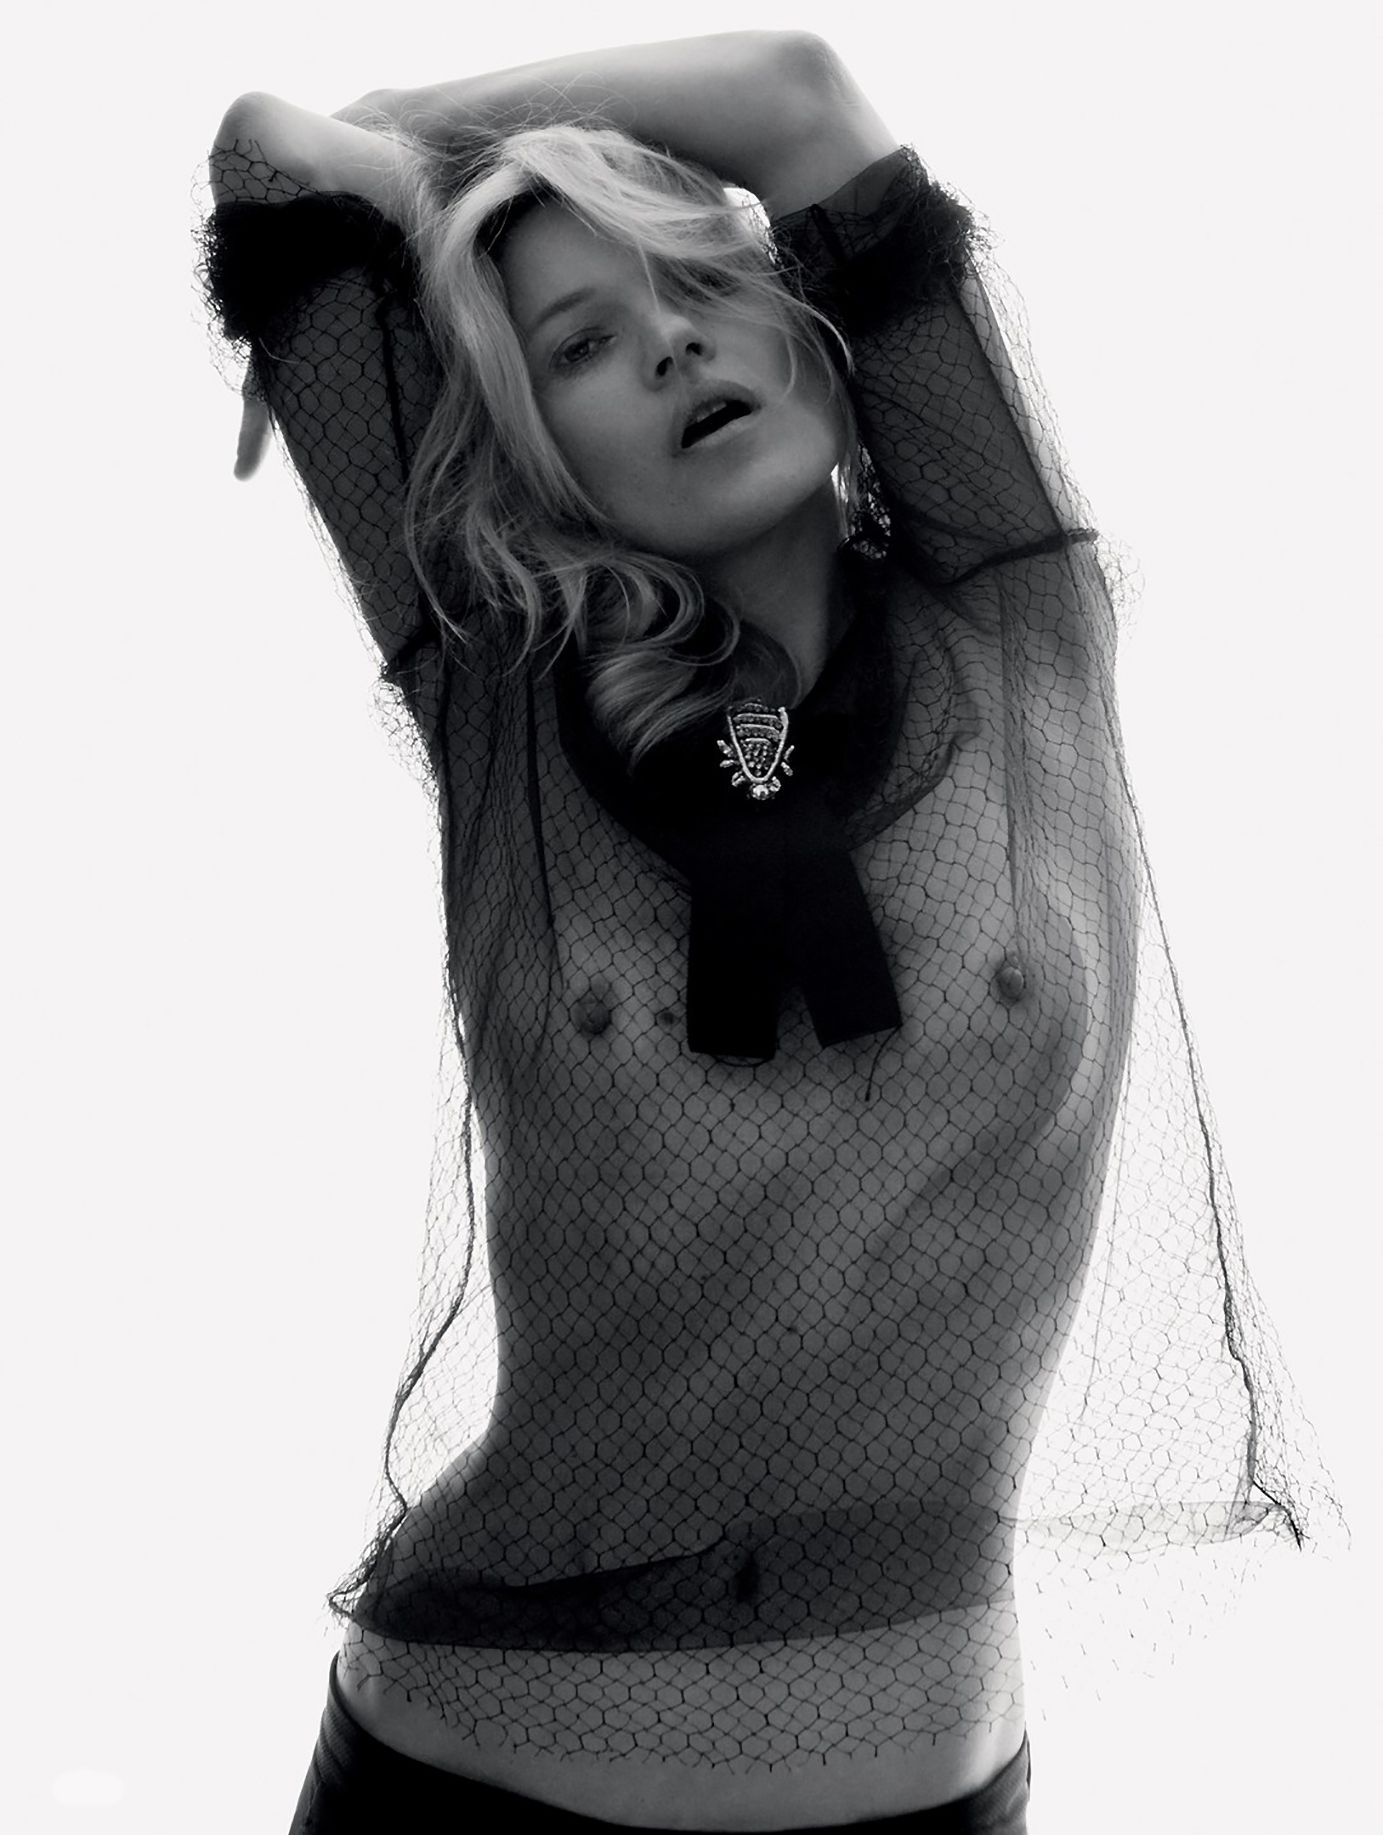 Kate Moss See Through (7 Photos)